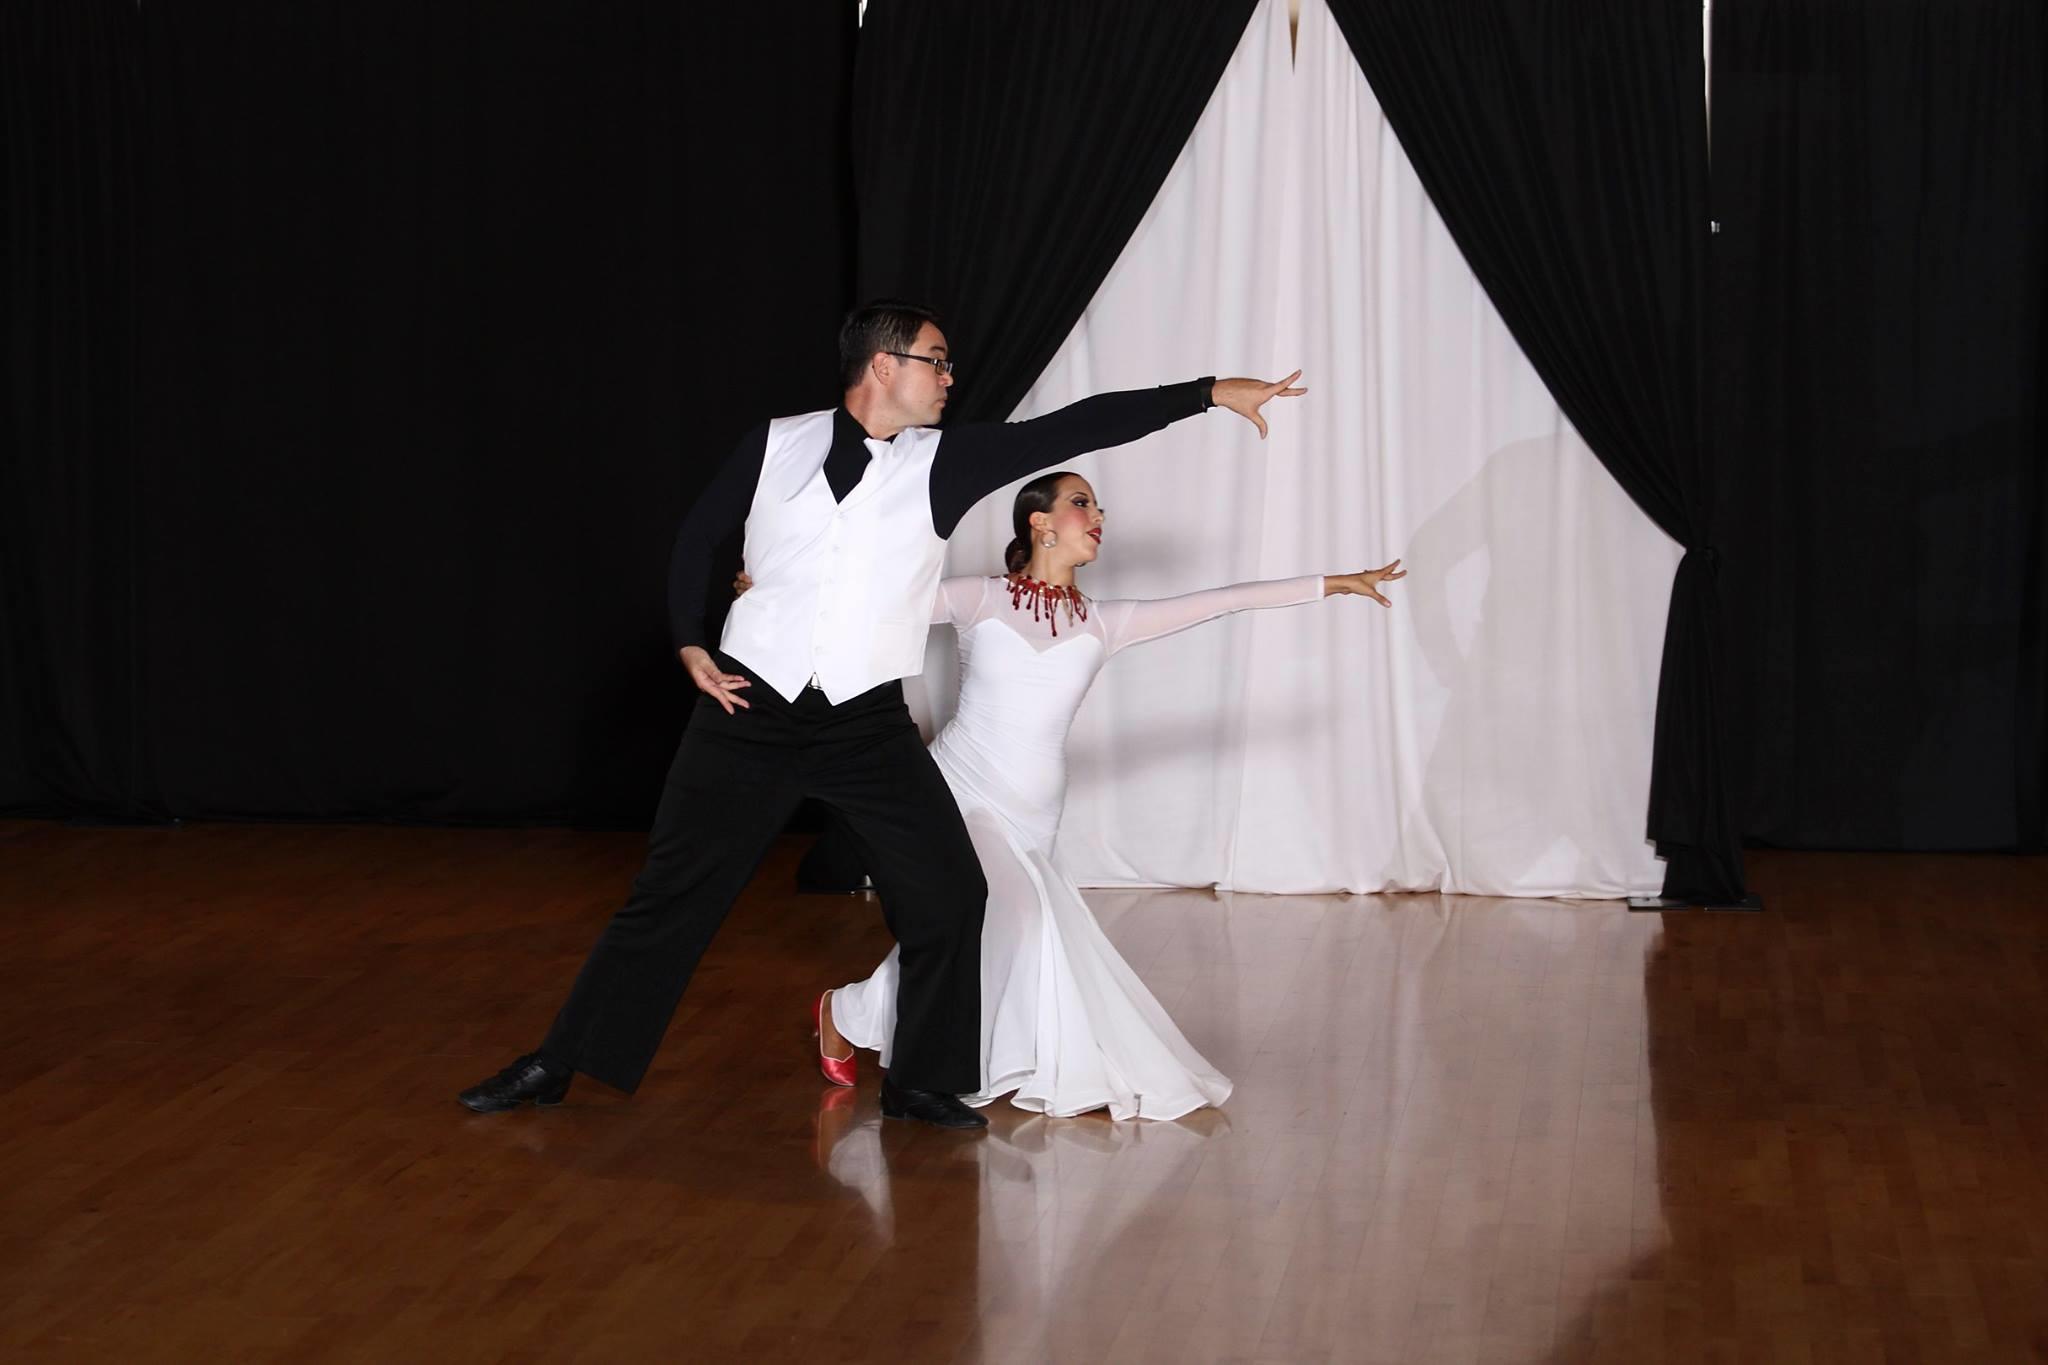 Dance Center of Charlotte image 1